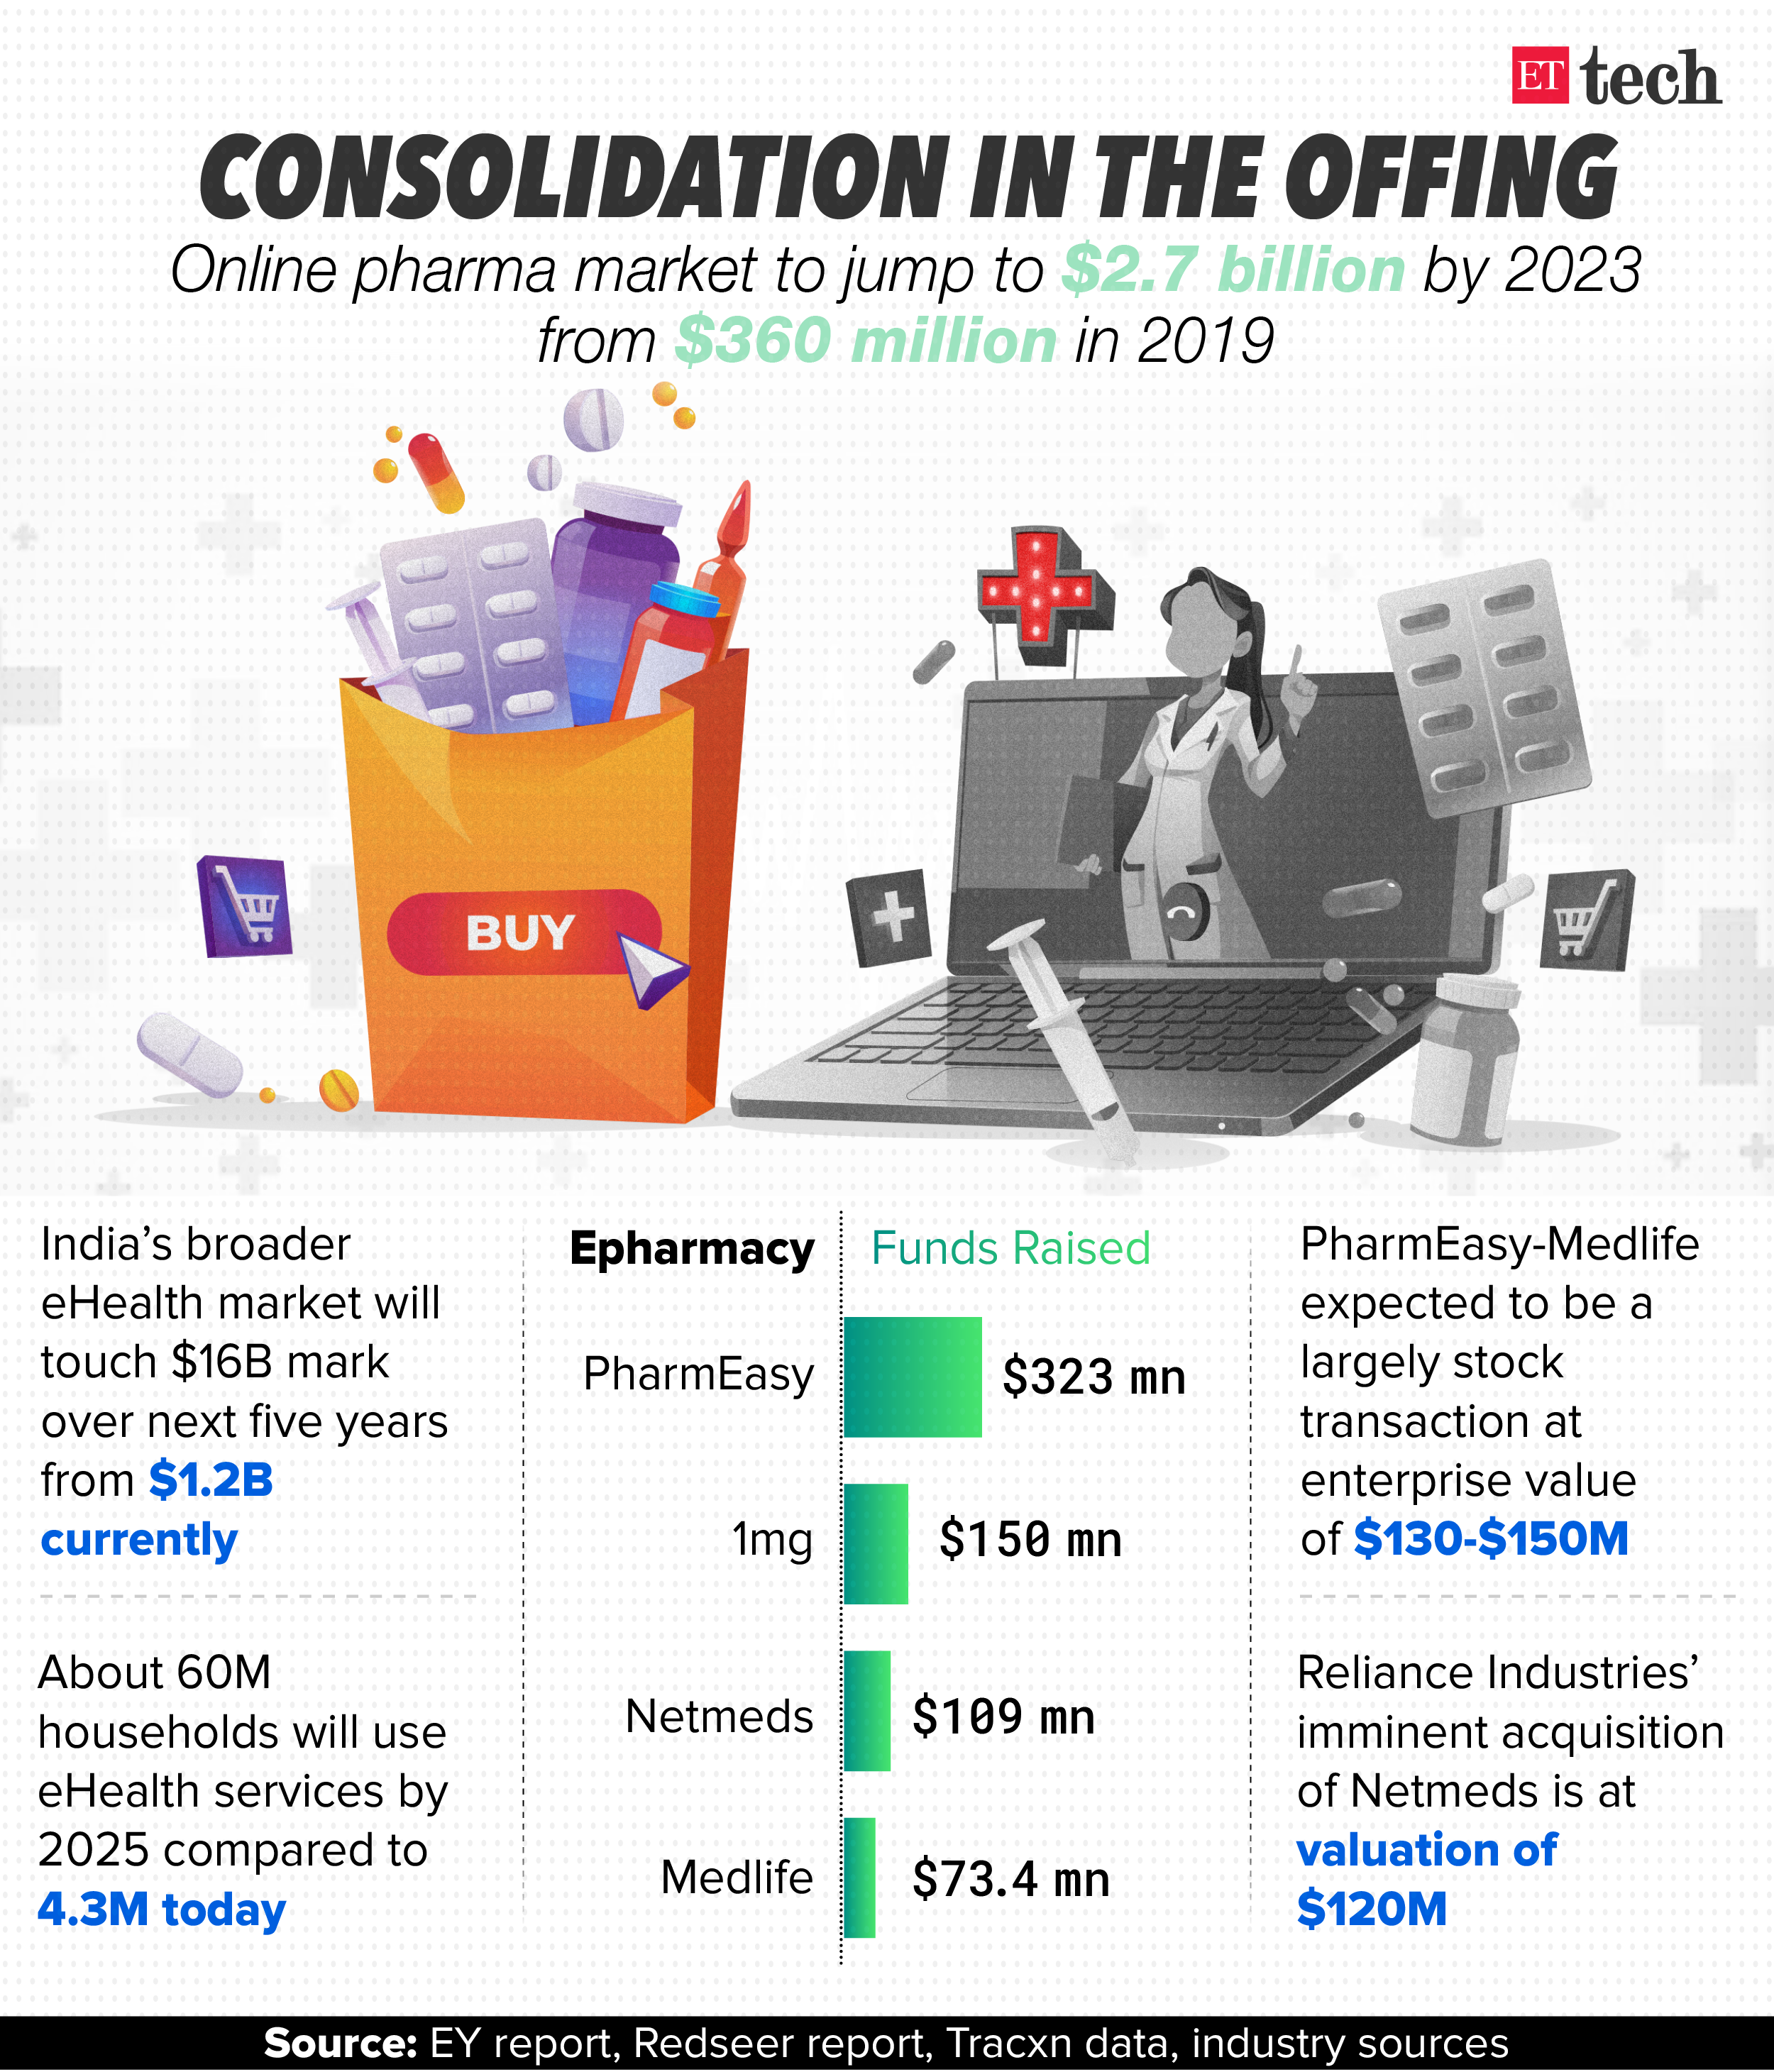 ETtech Top 5: Trump wants a cut for TikTok deal, e-pharma consolidation & more